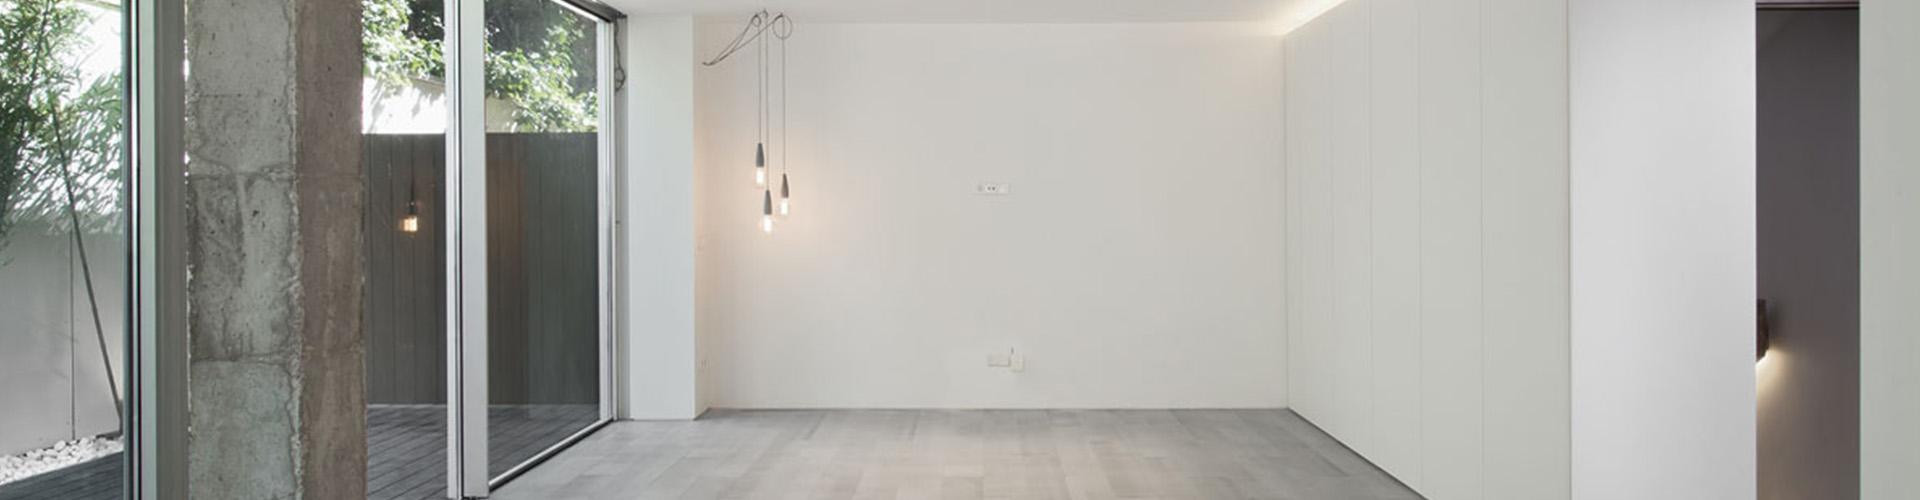 salon-y-patio-reforma-vivienda-moderna-materiales-iluminacion-Slider